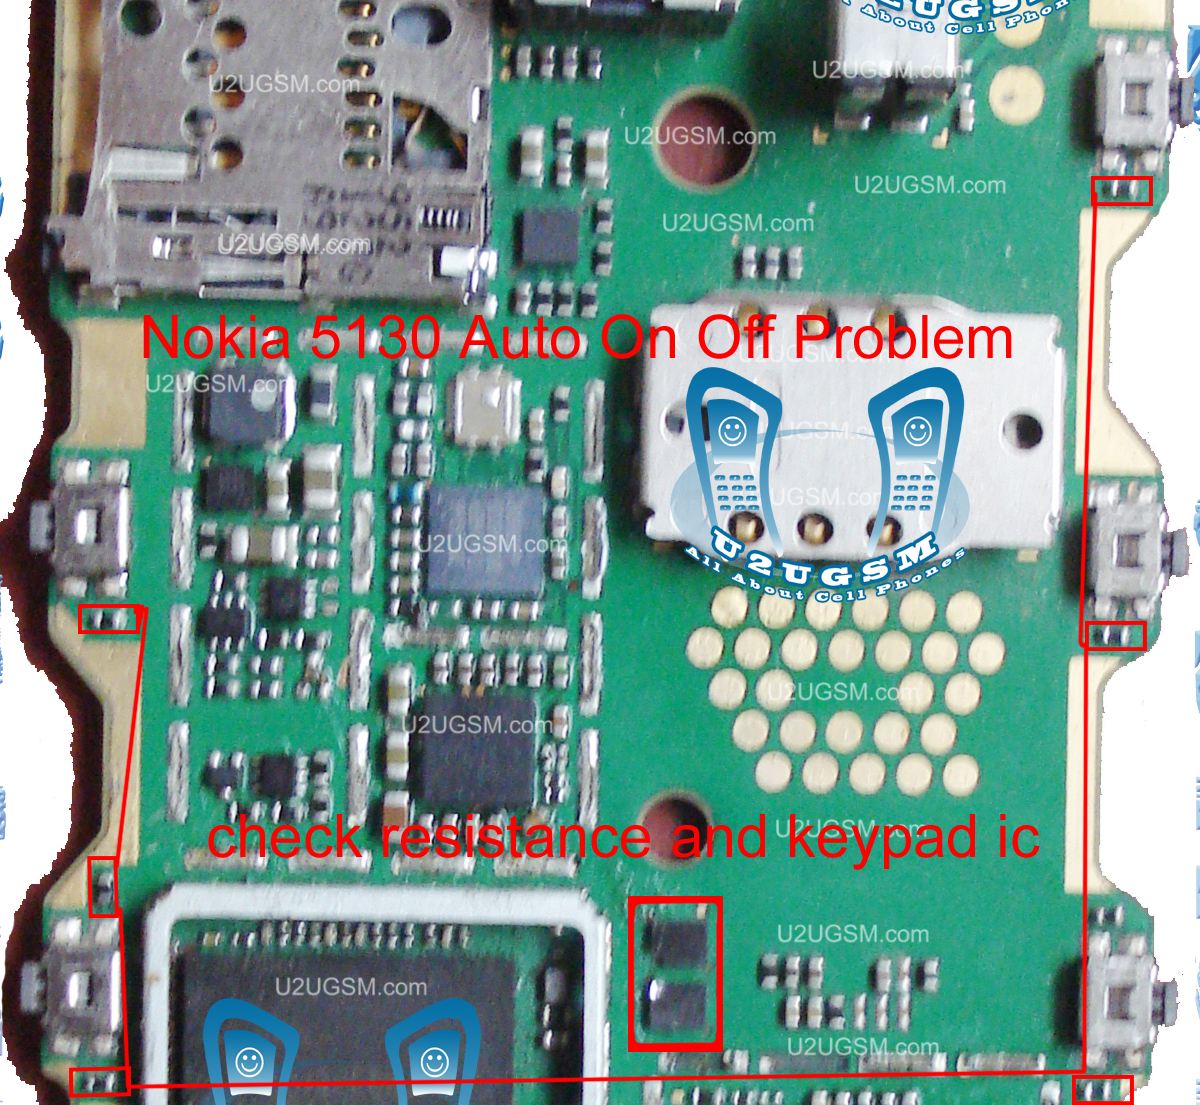 Nokia 5130 Auto On Off Or Restart Problem Solution Parts